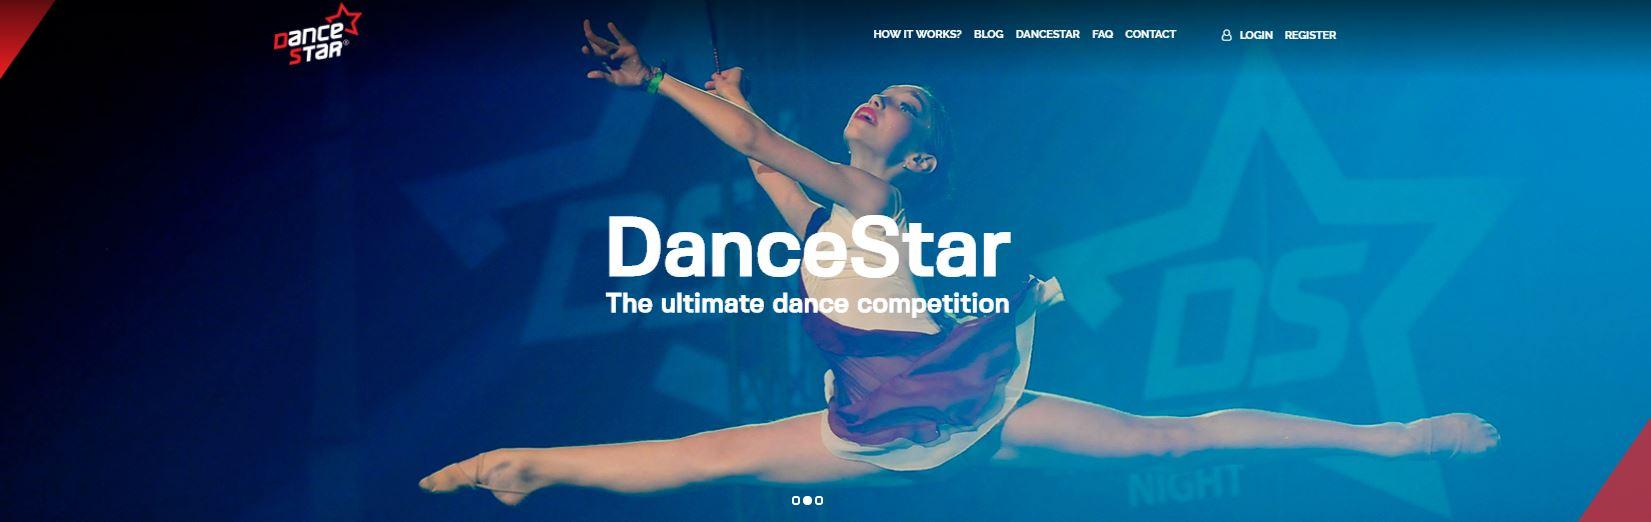 DanceStar new website is launched!